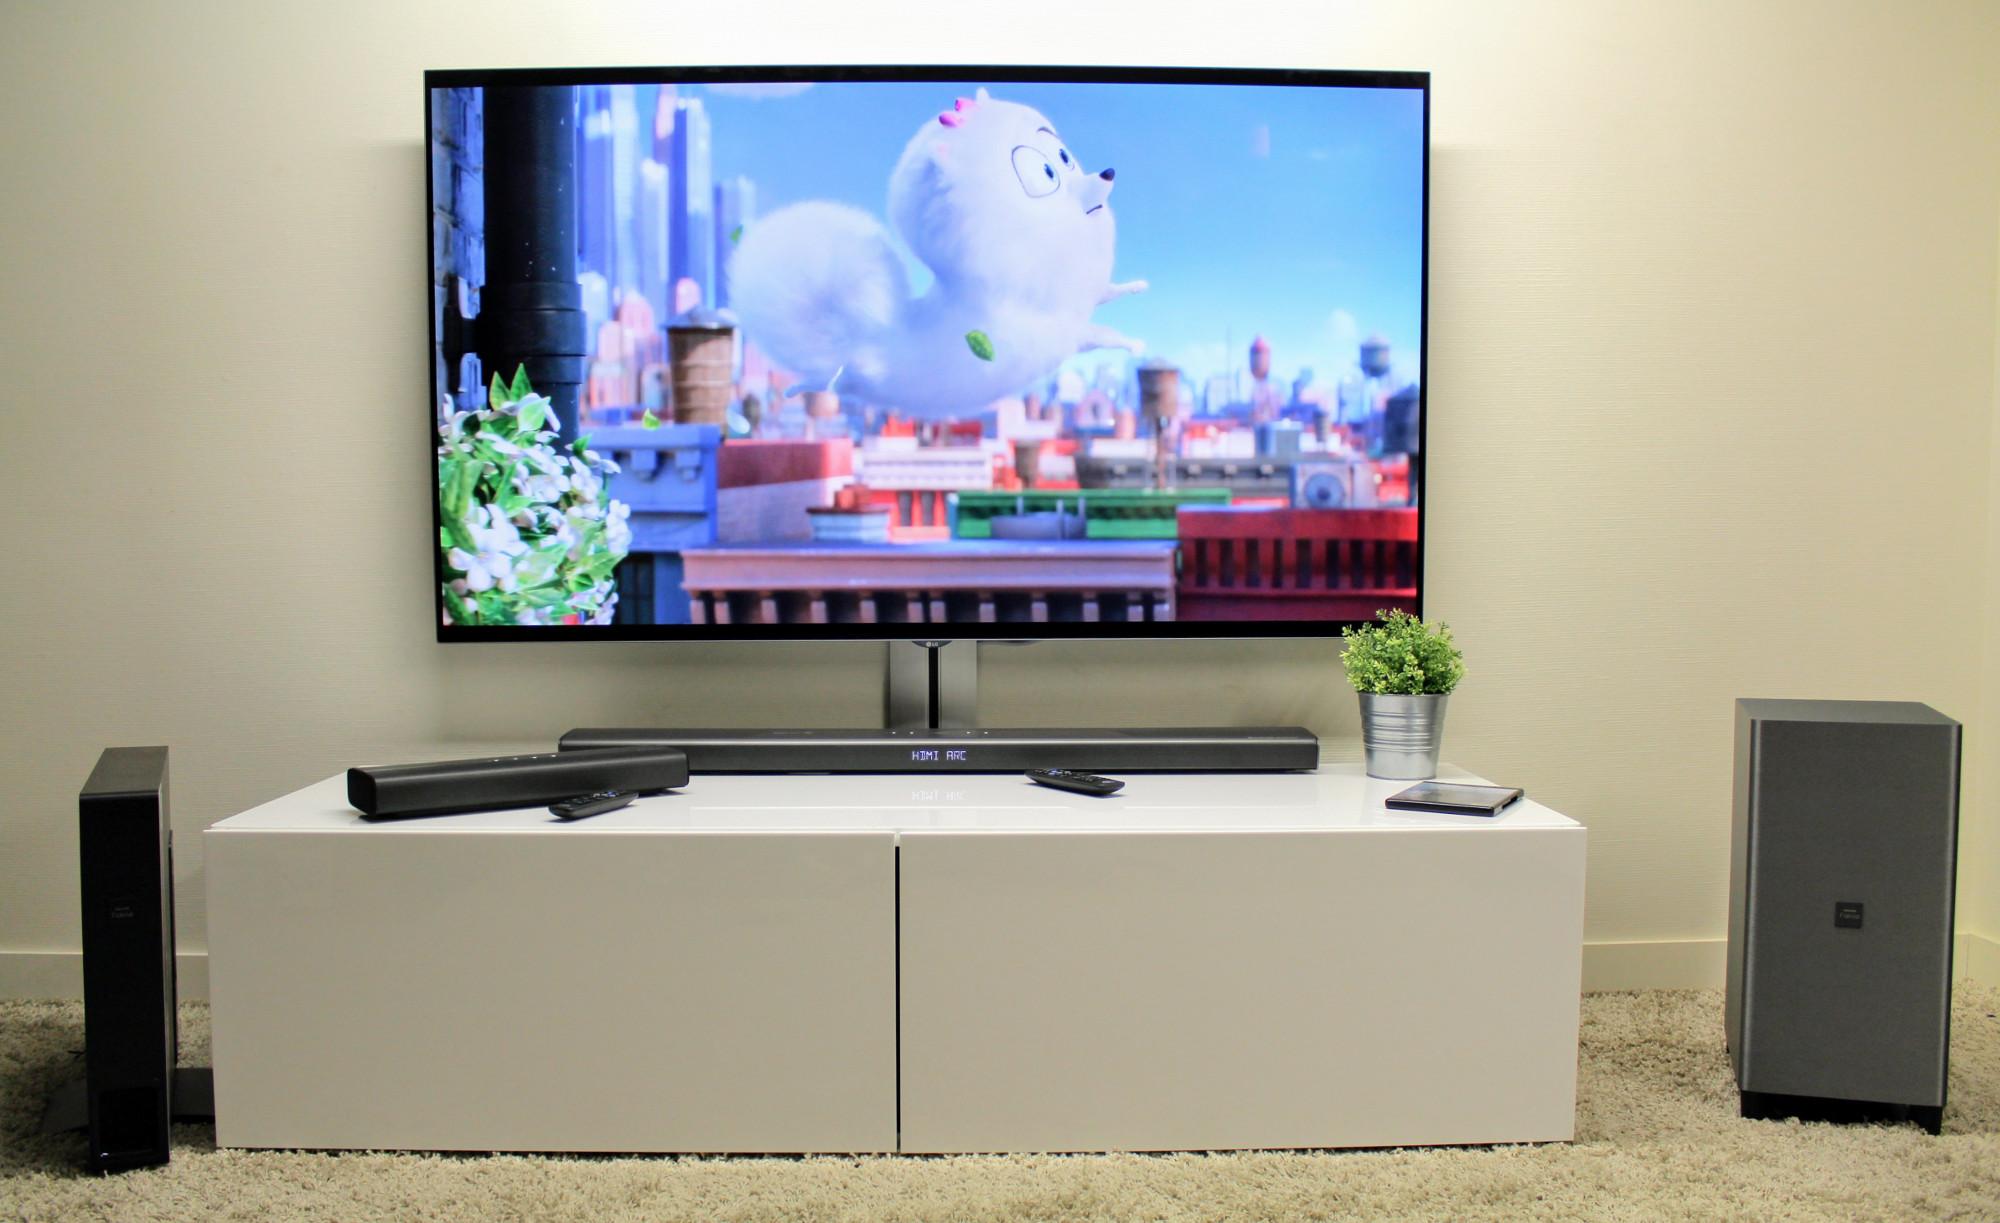 Review Philips Fidelio B8 And Philips Fidelio B1 Son Vid O Com  # Les Table Pour Television Nouveaute